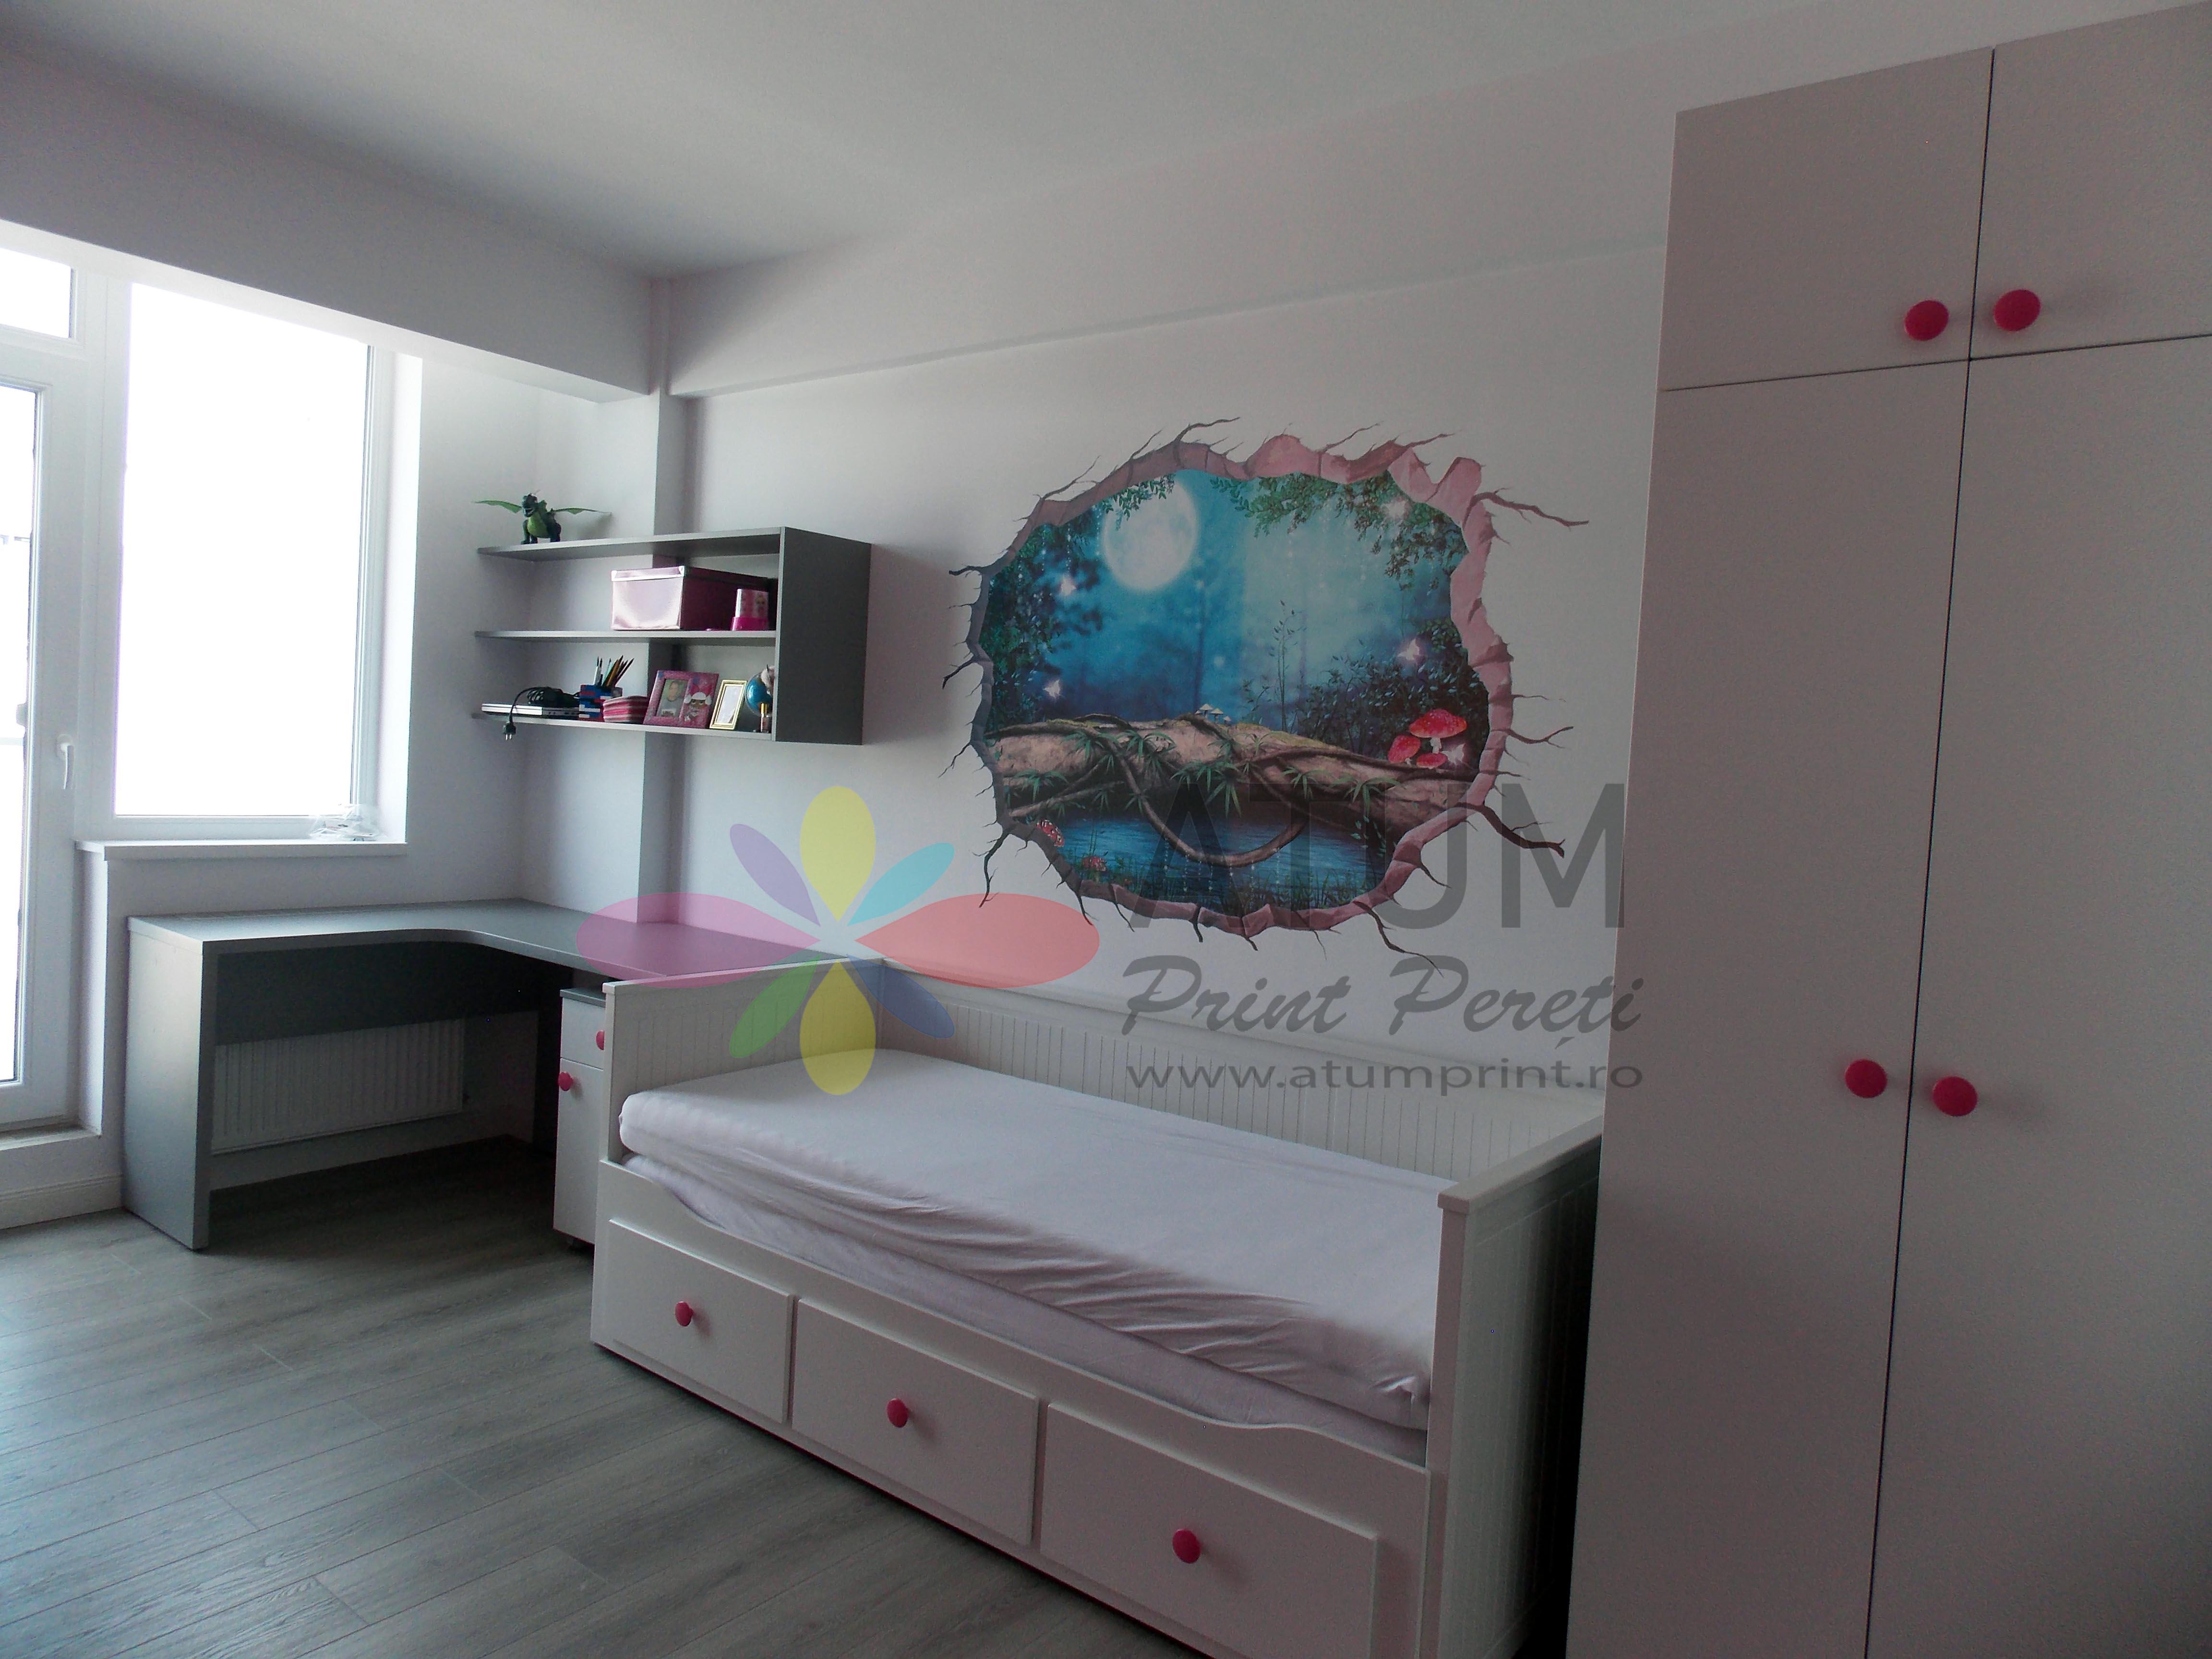 Fairytale – imprimare pe perete